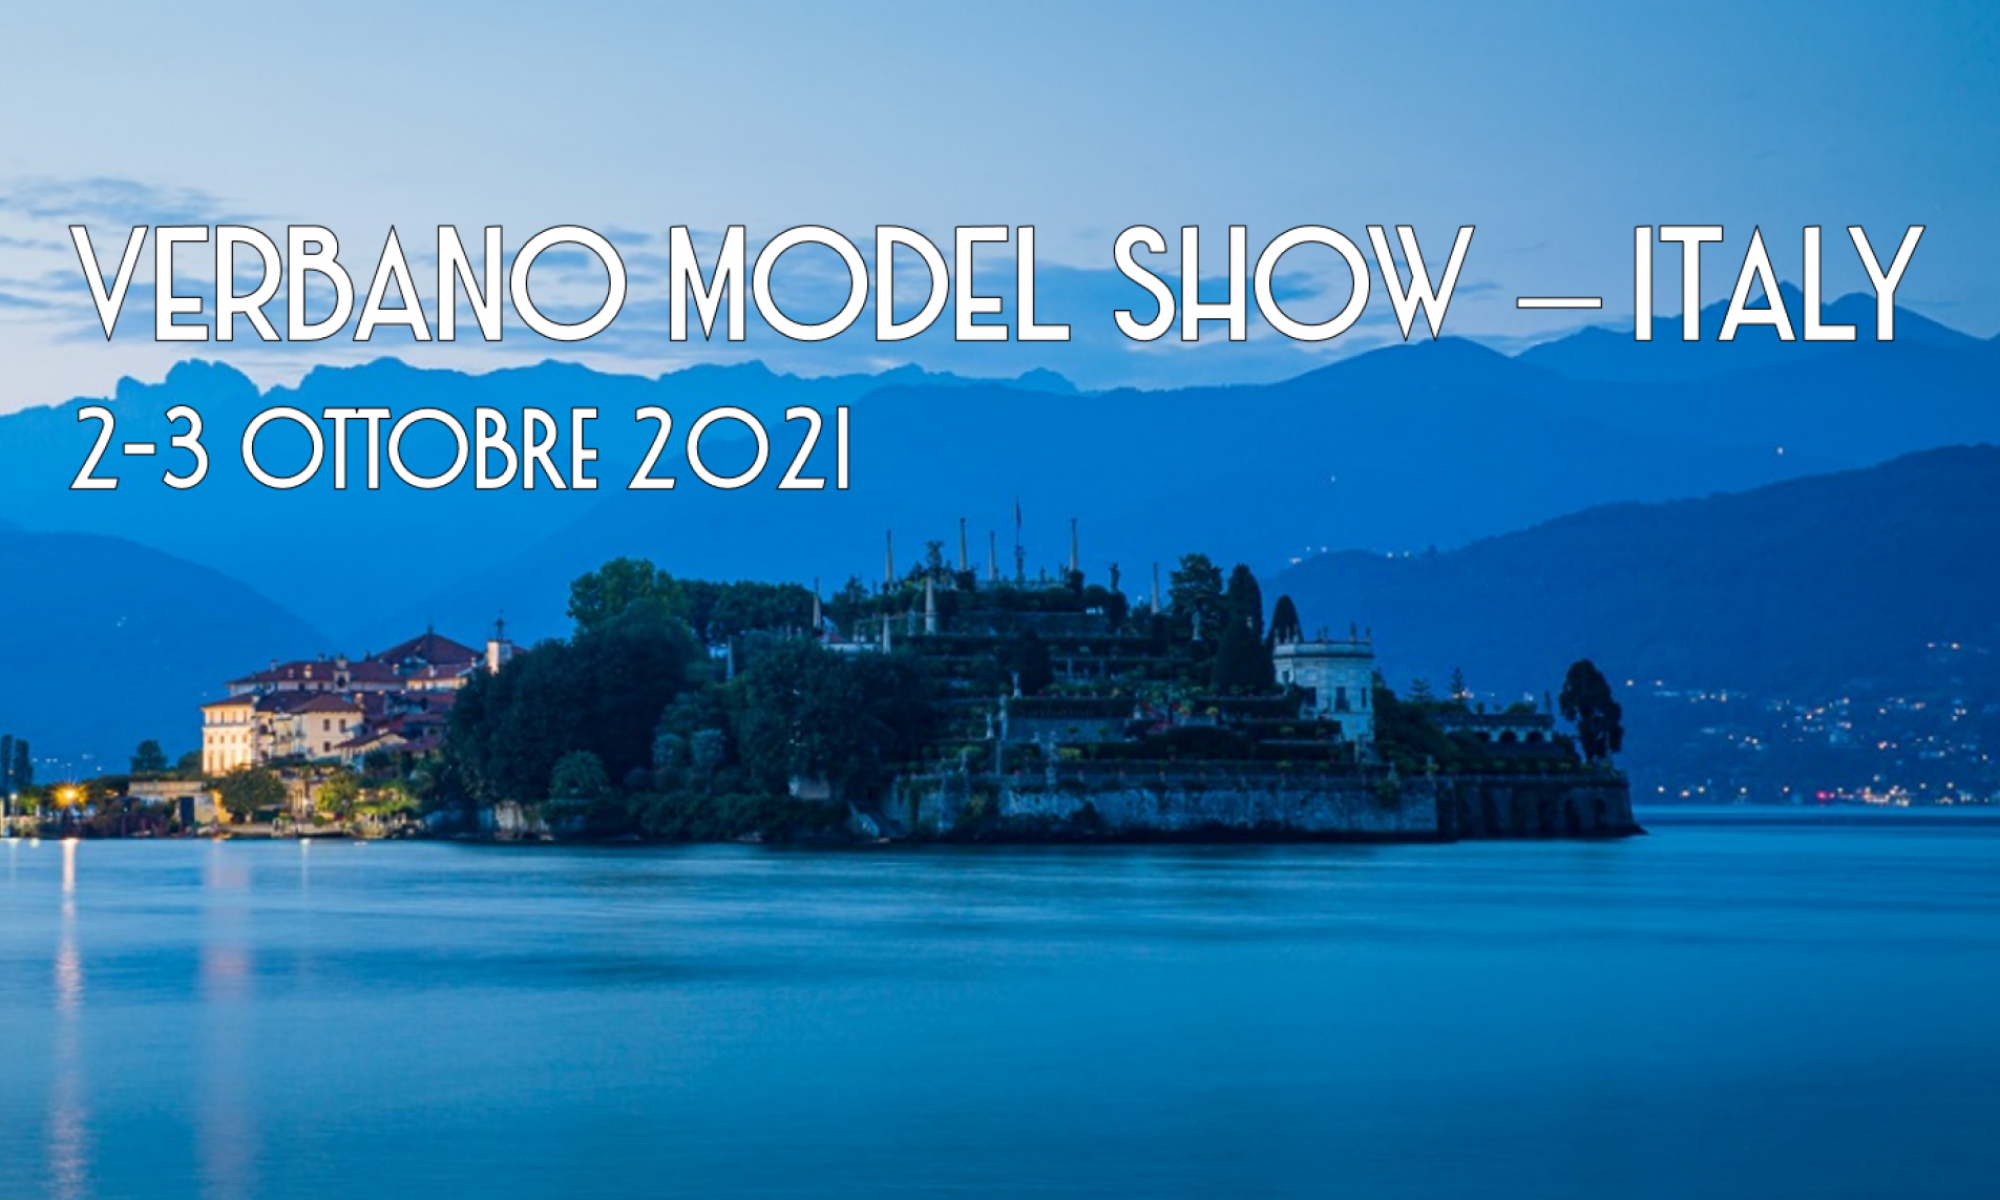 Verbano Model Show 2021